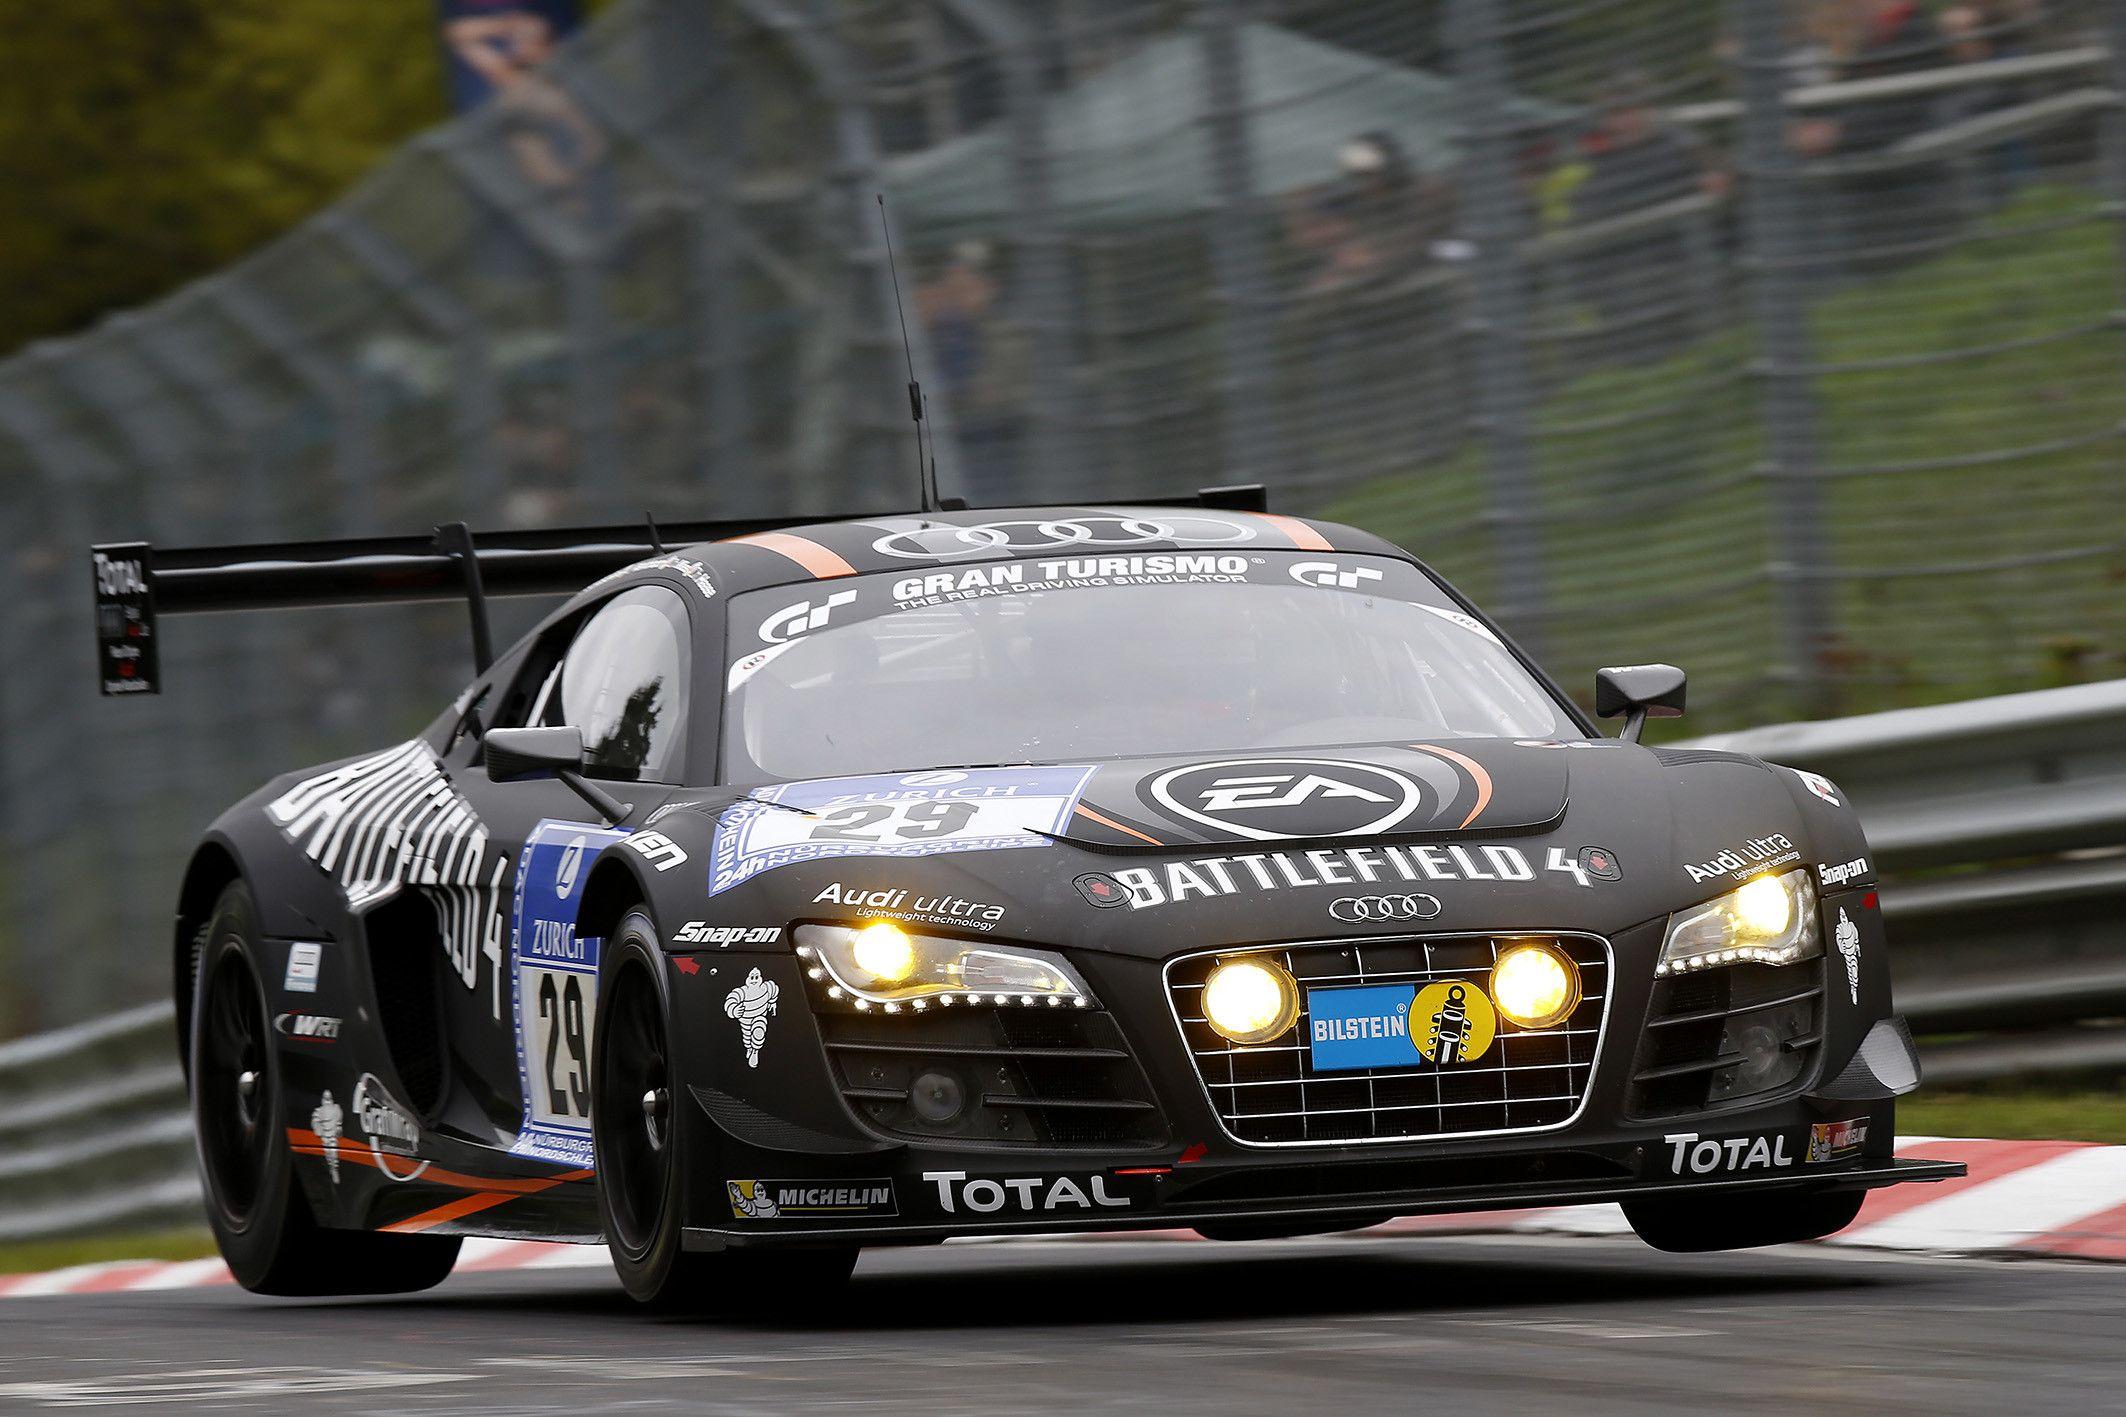 Audi R8 Gt3 Race Car Battlefield 4 Team